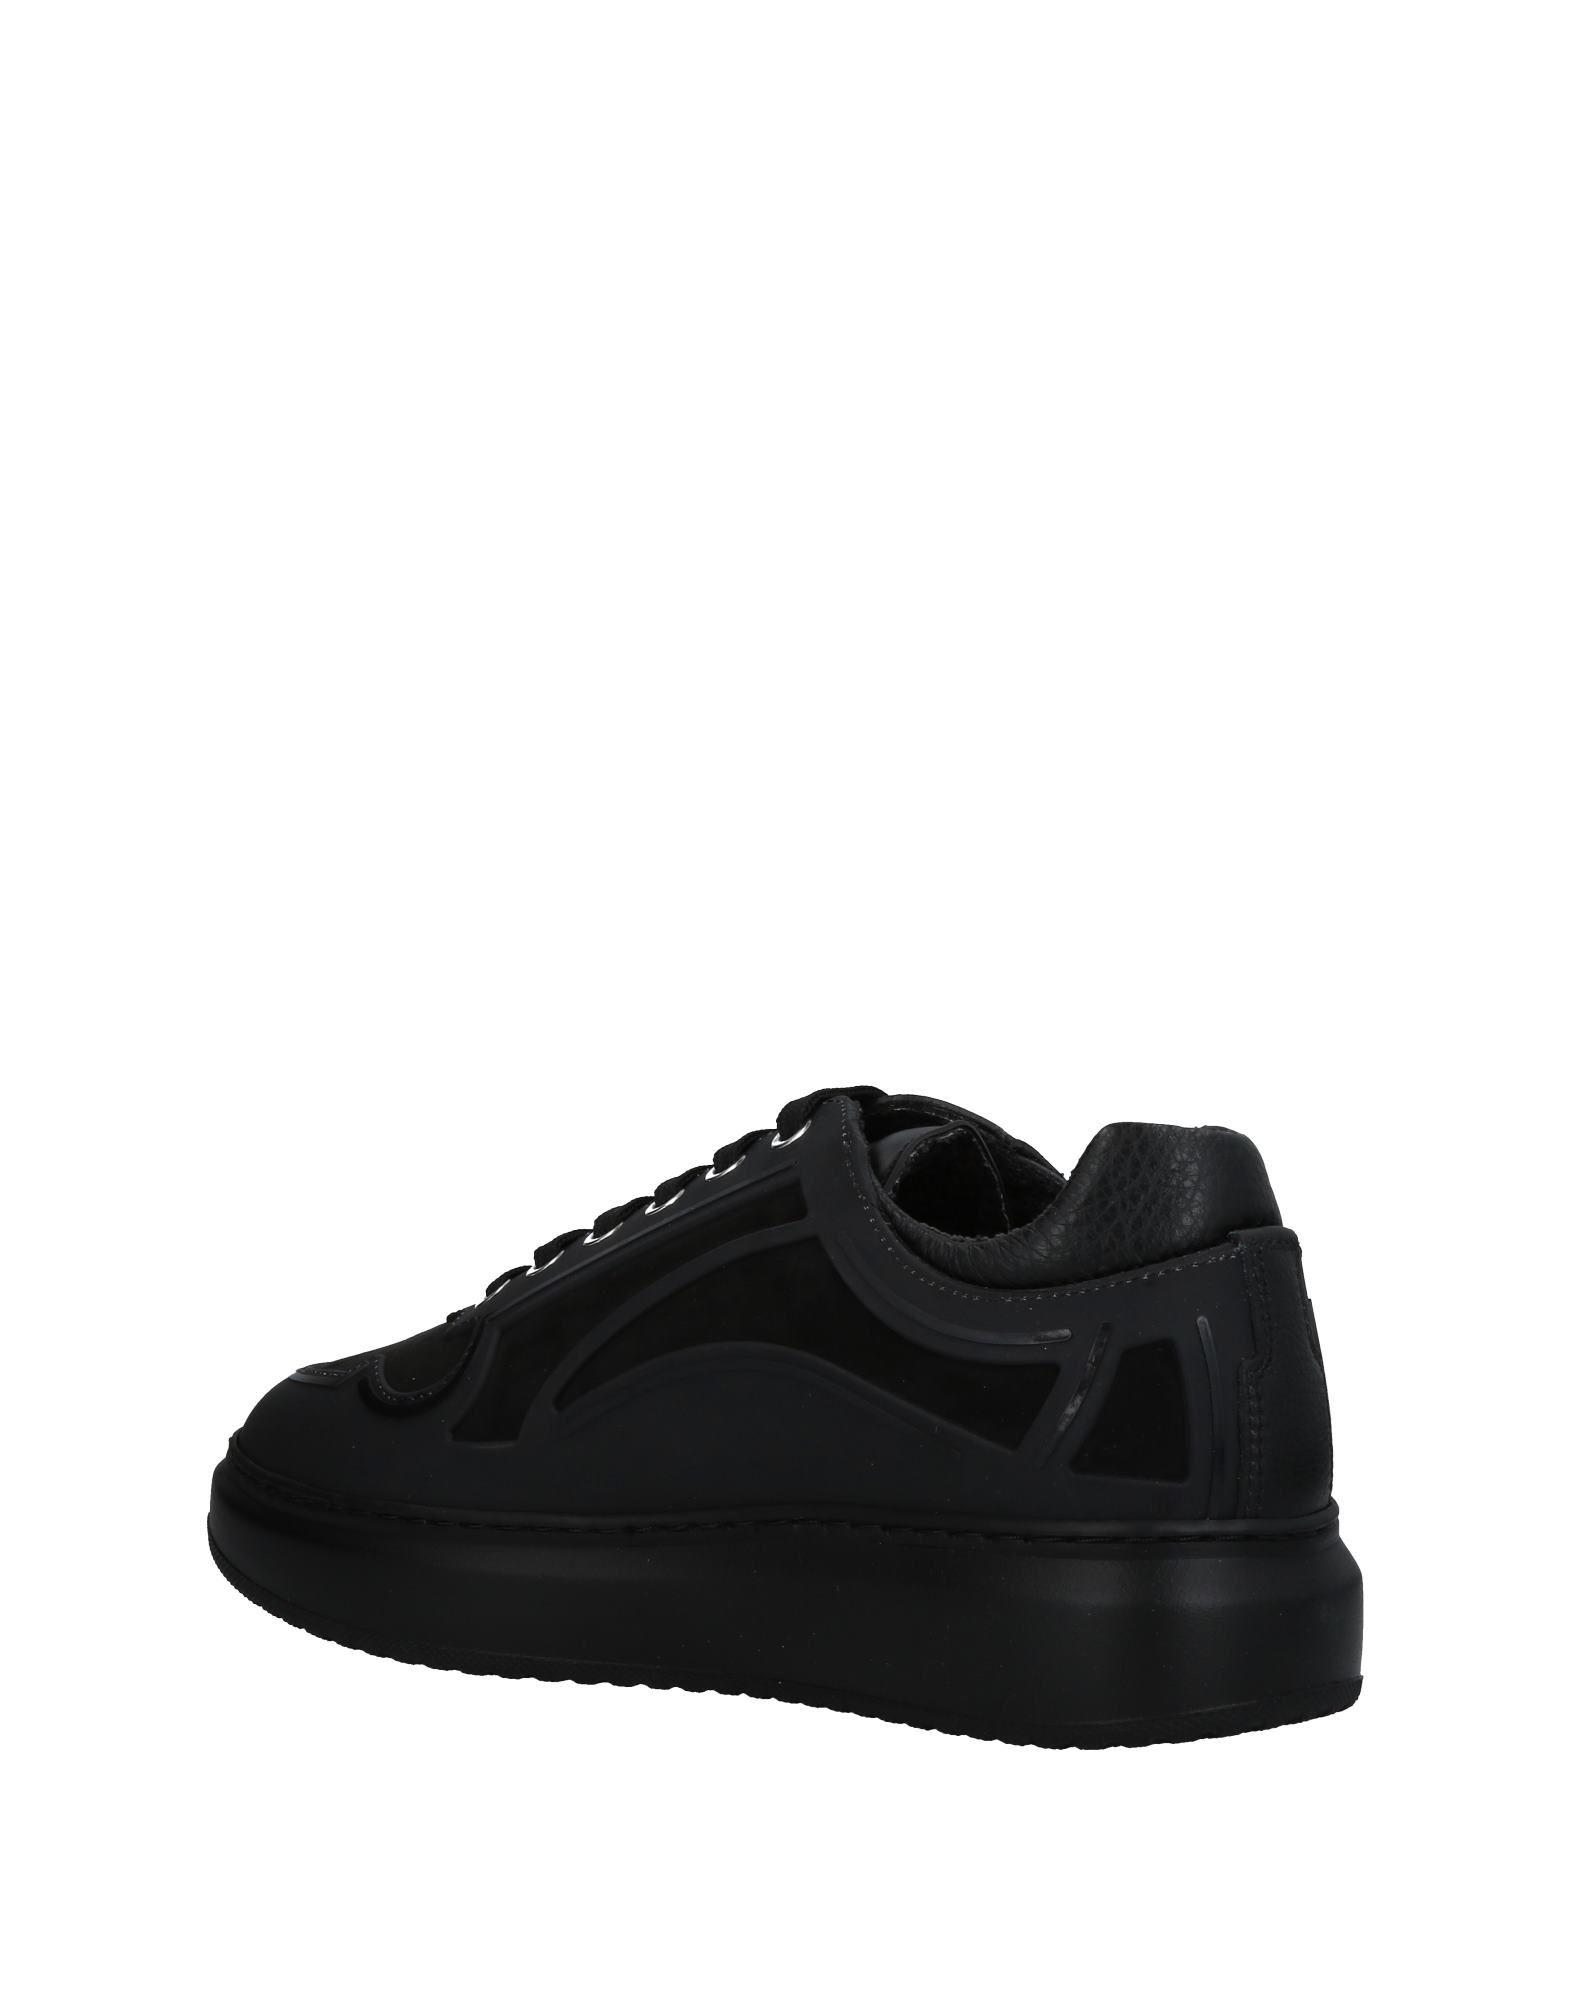 Pollini Gute Sneakers Herren  11447496DA Gute Pollini Qualität beliebte Schuhe 4a4c76